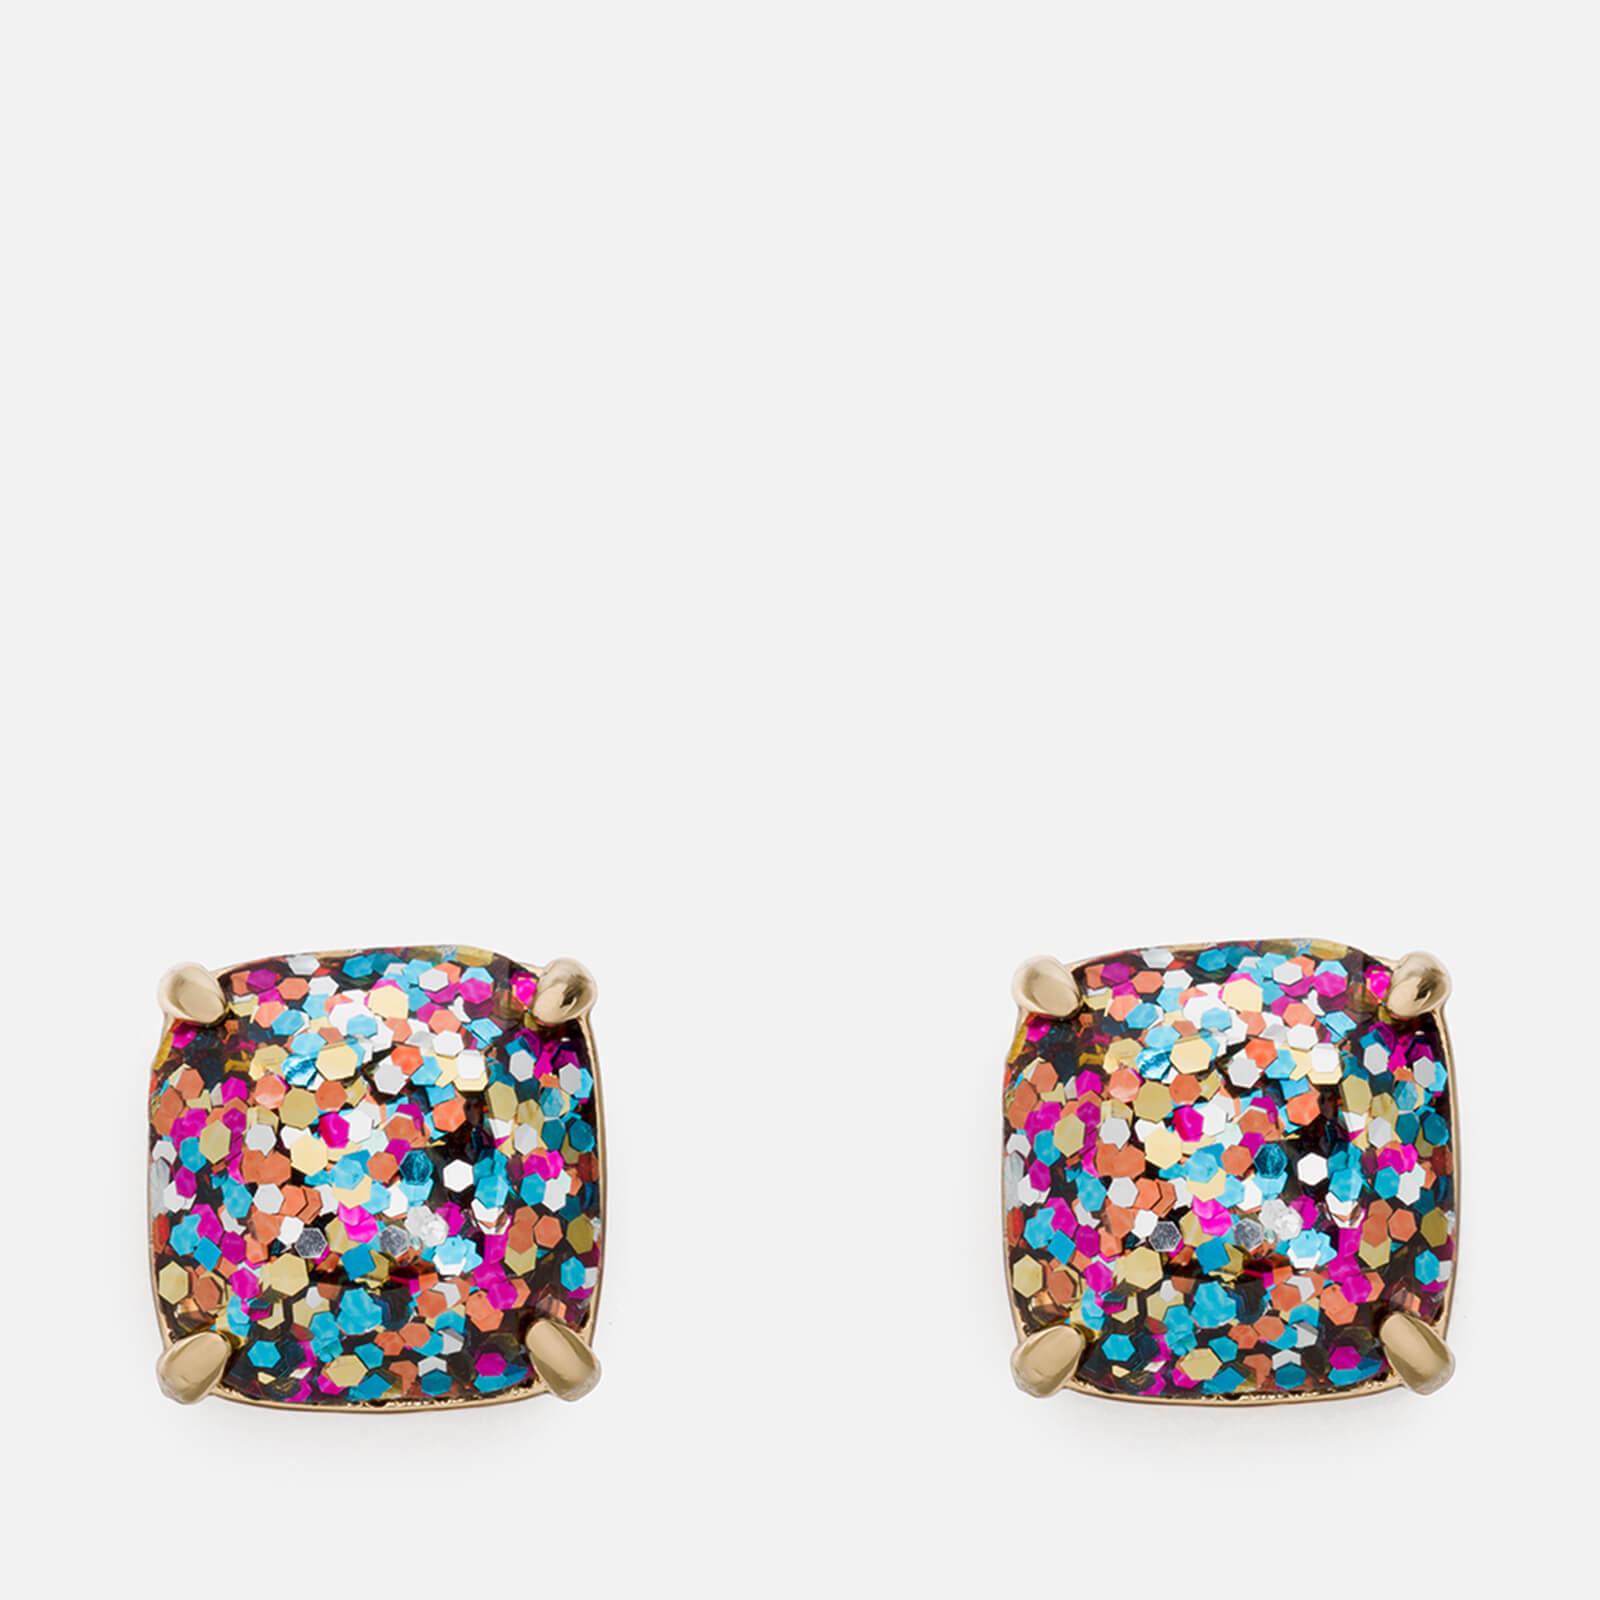 Kate Spade New York Women's Small Square Studs - Multi Glitter